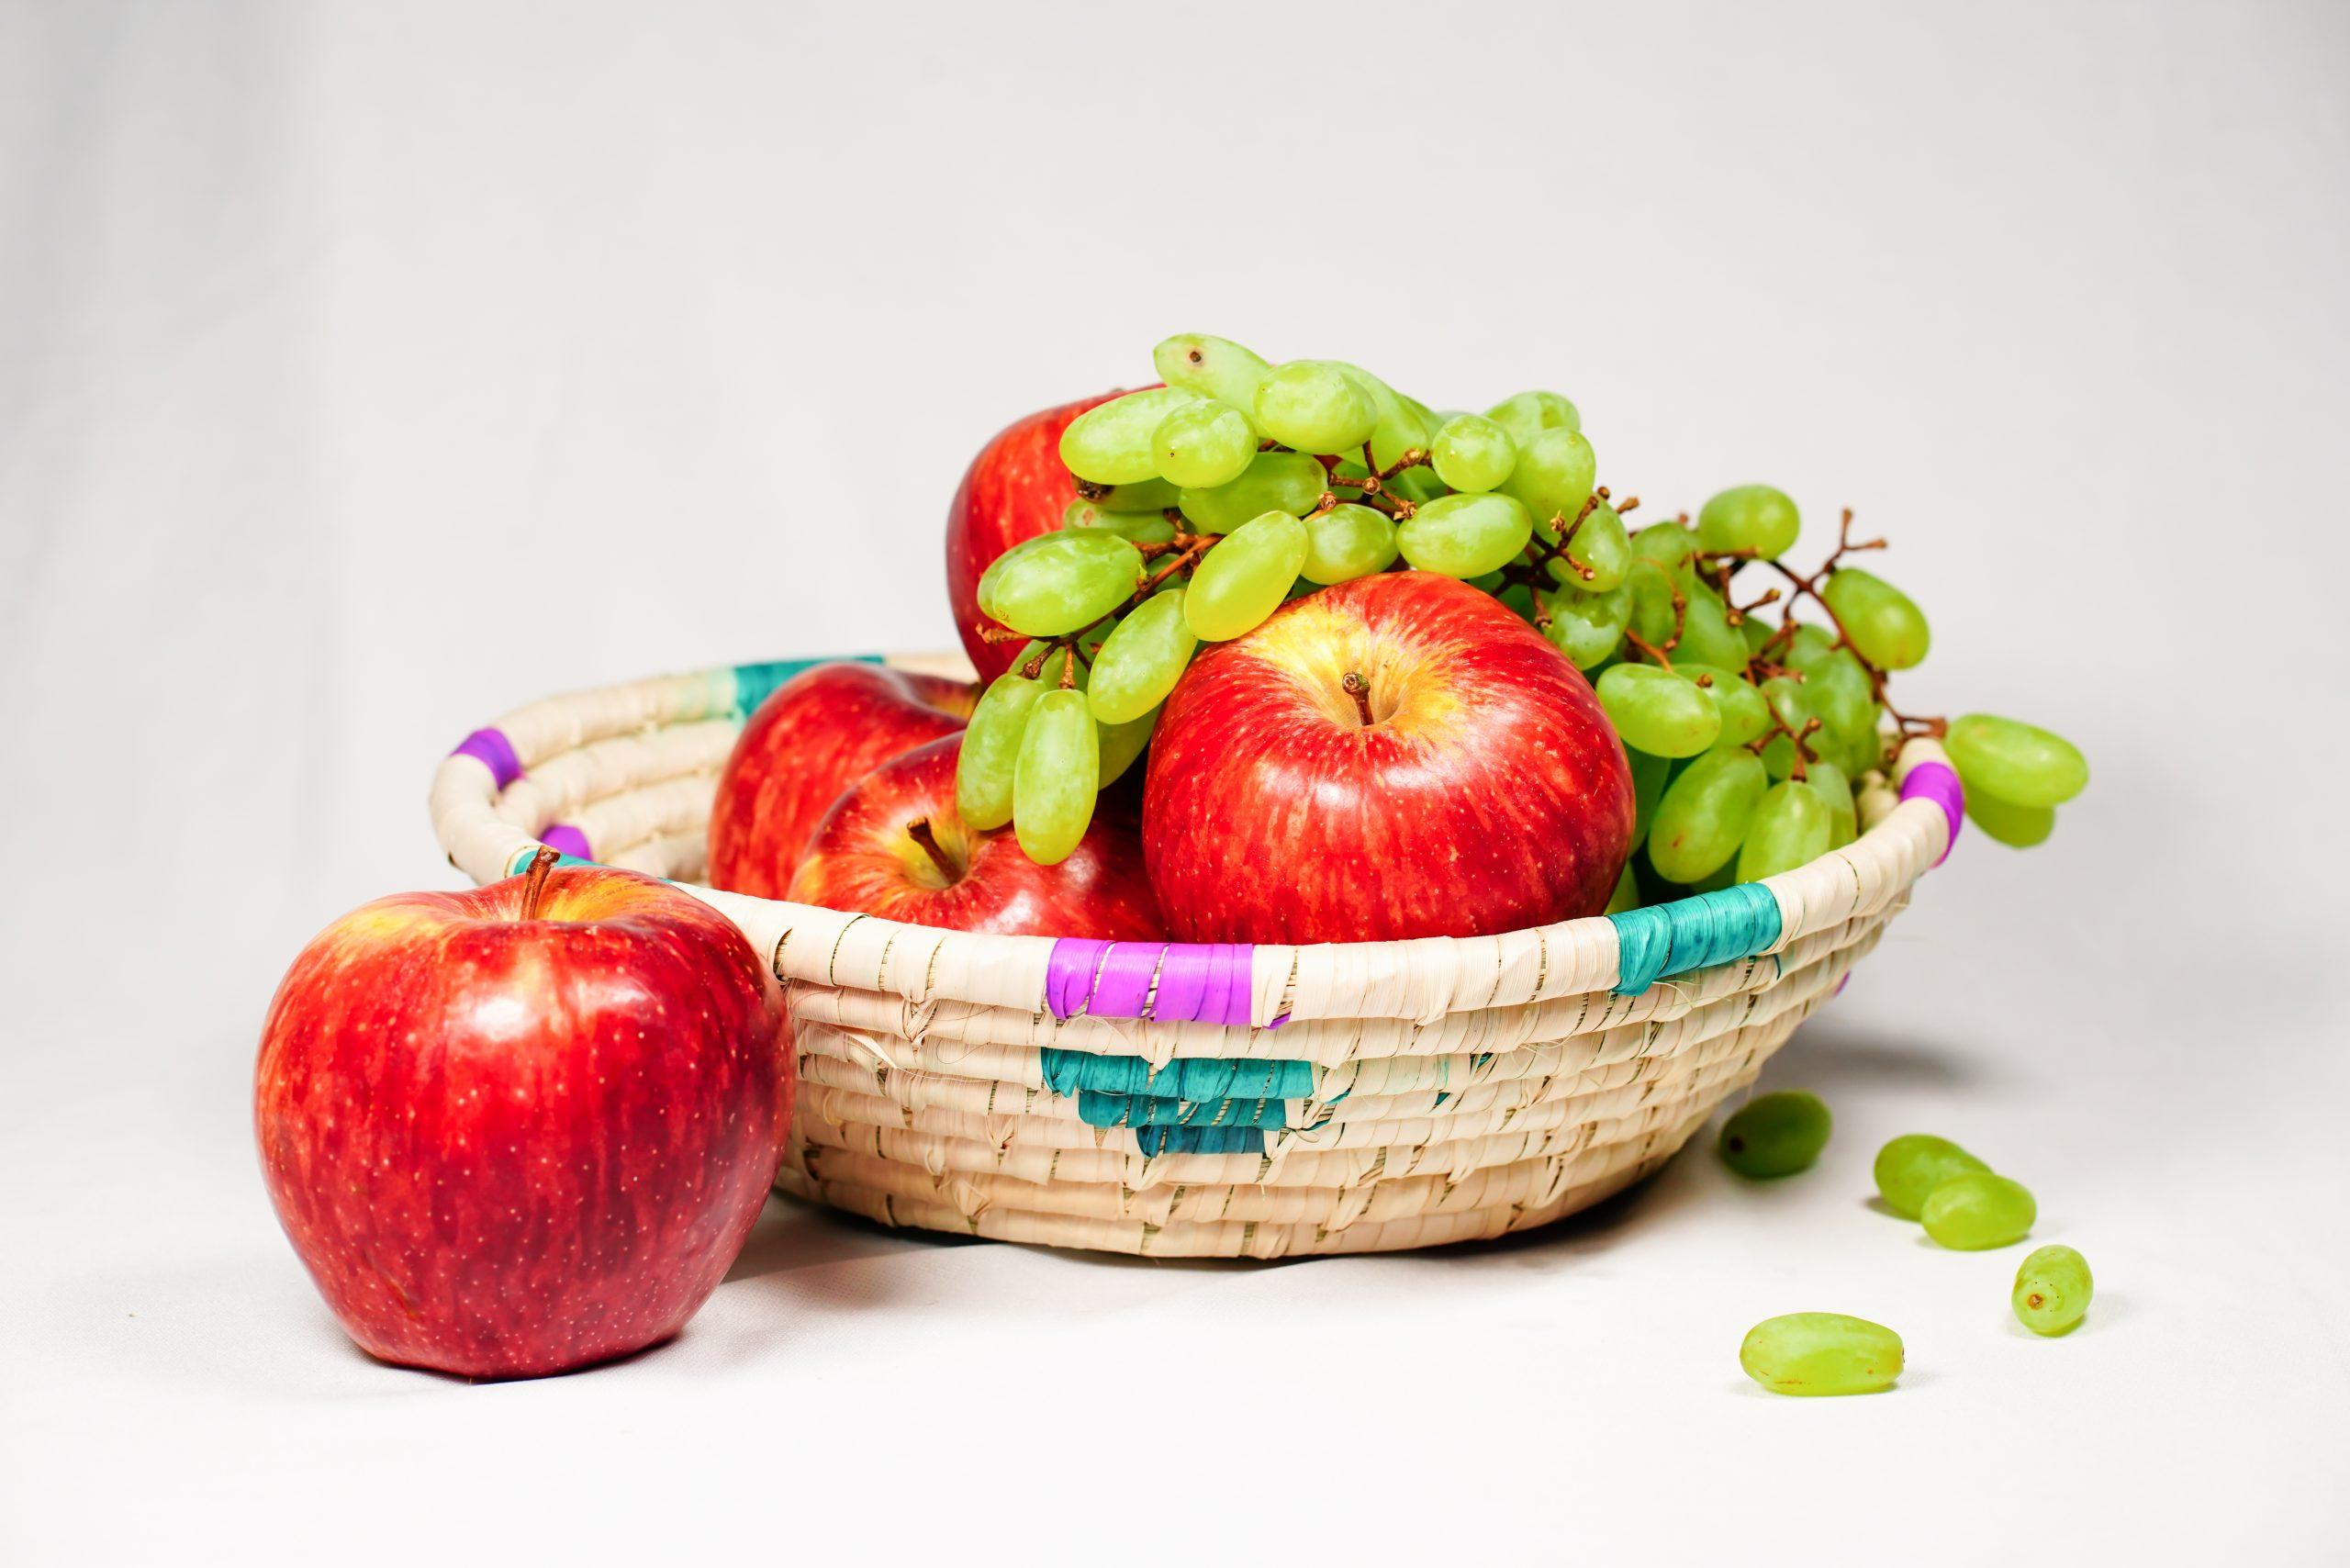 a basket of fresh fruits